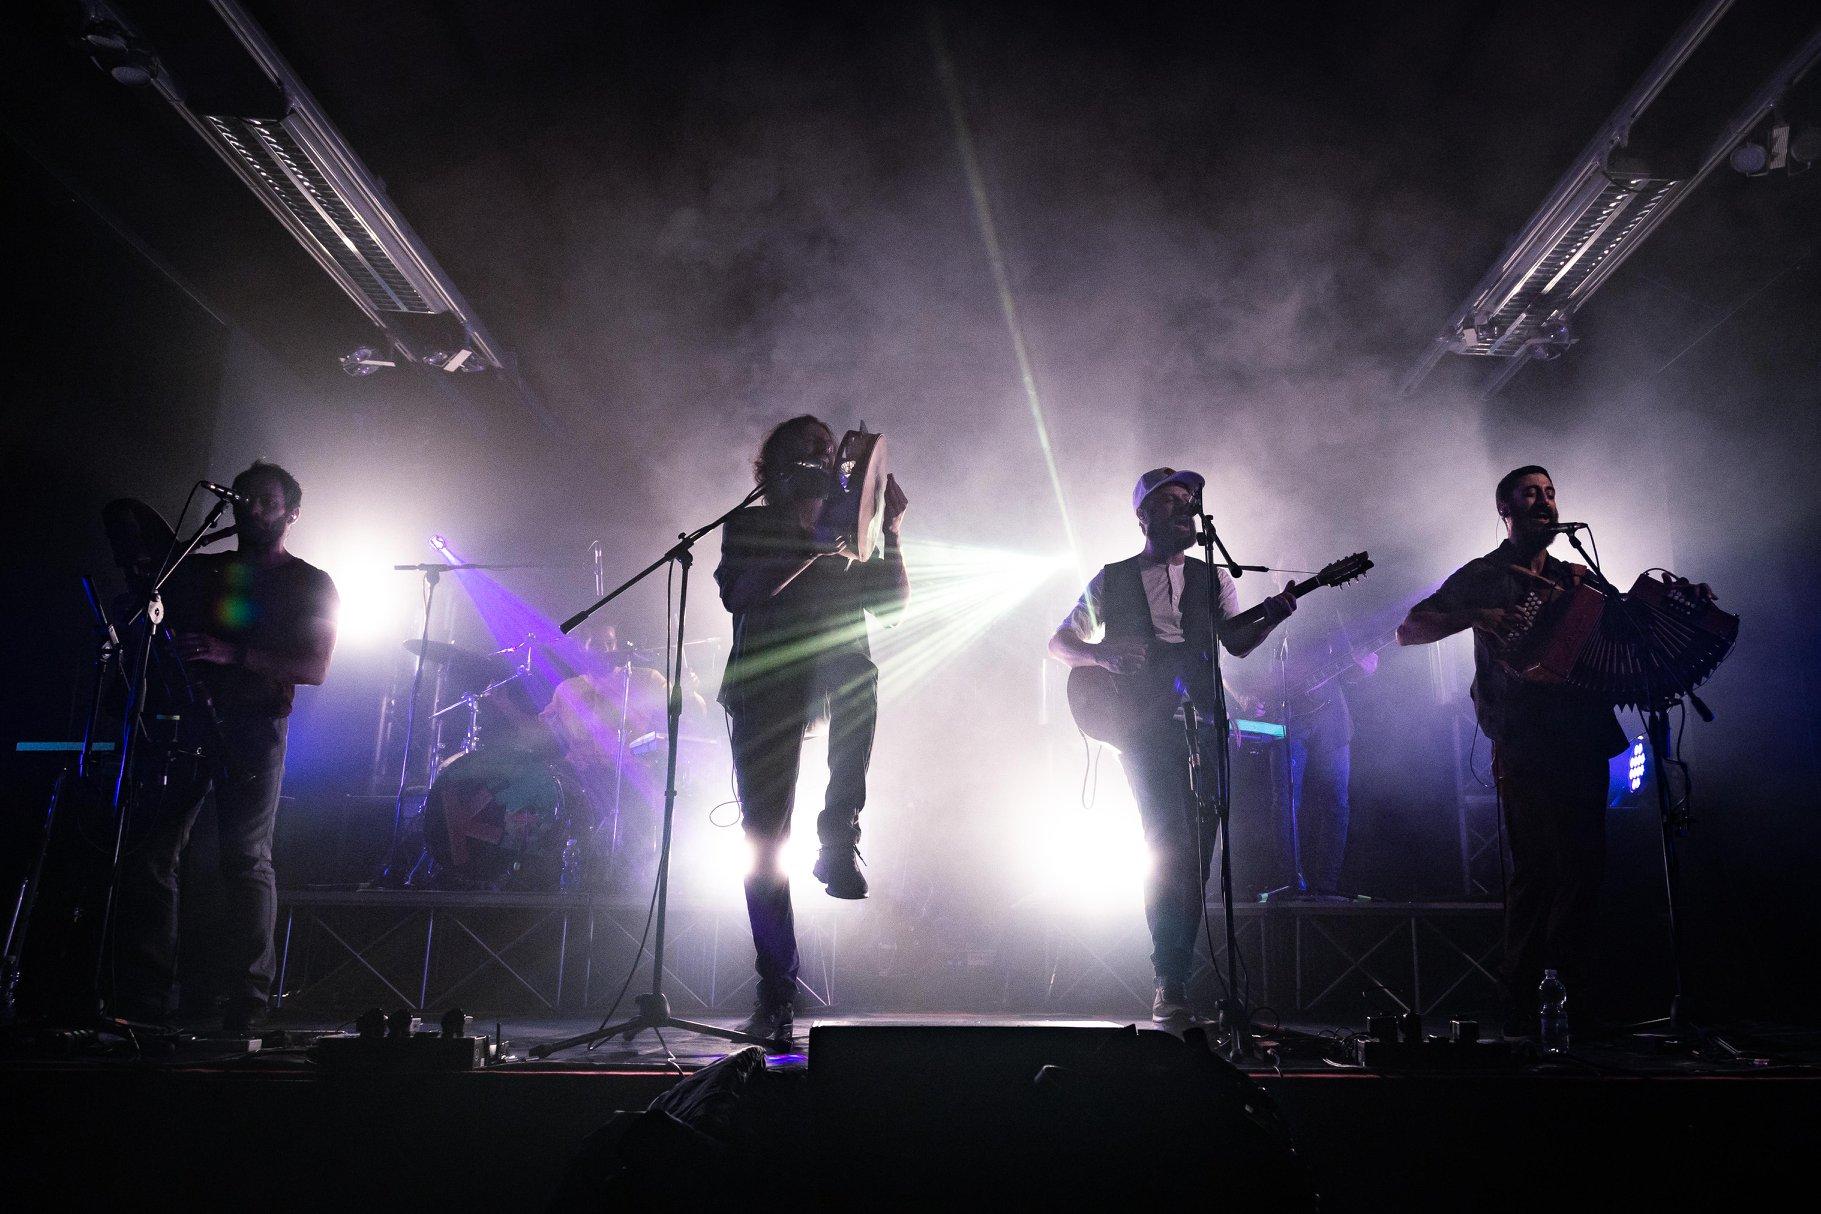 La band salentina Kalàscima, lanciata dal Puglia Sounds